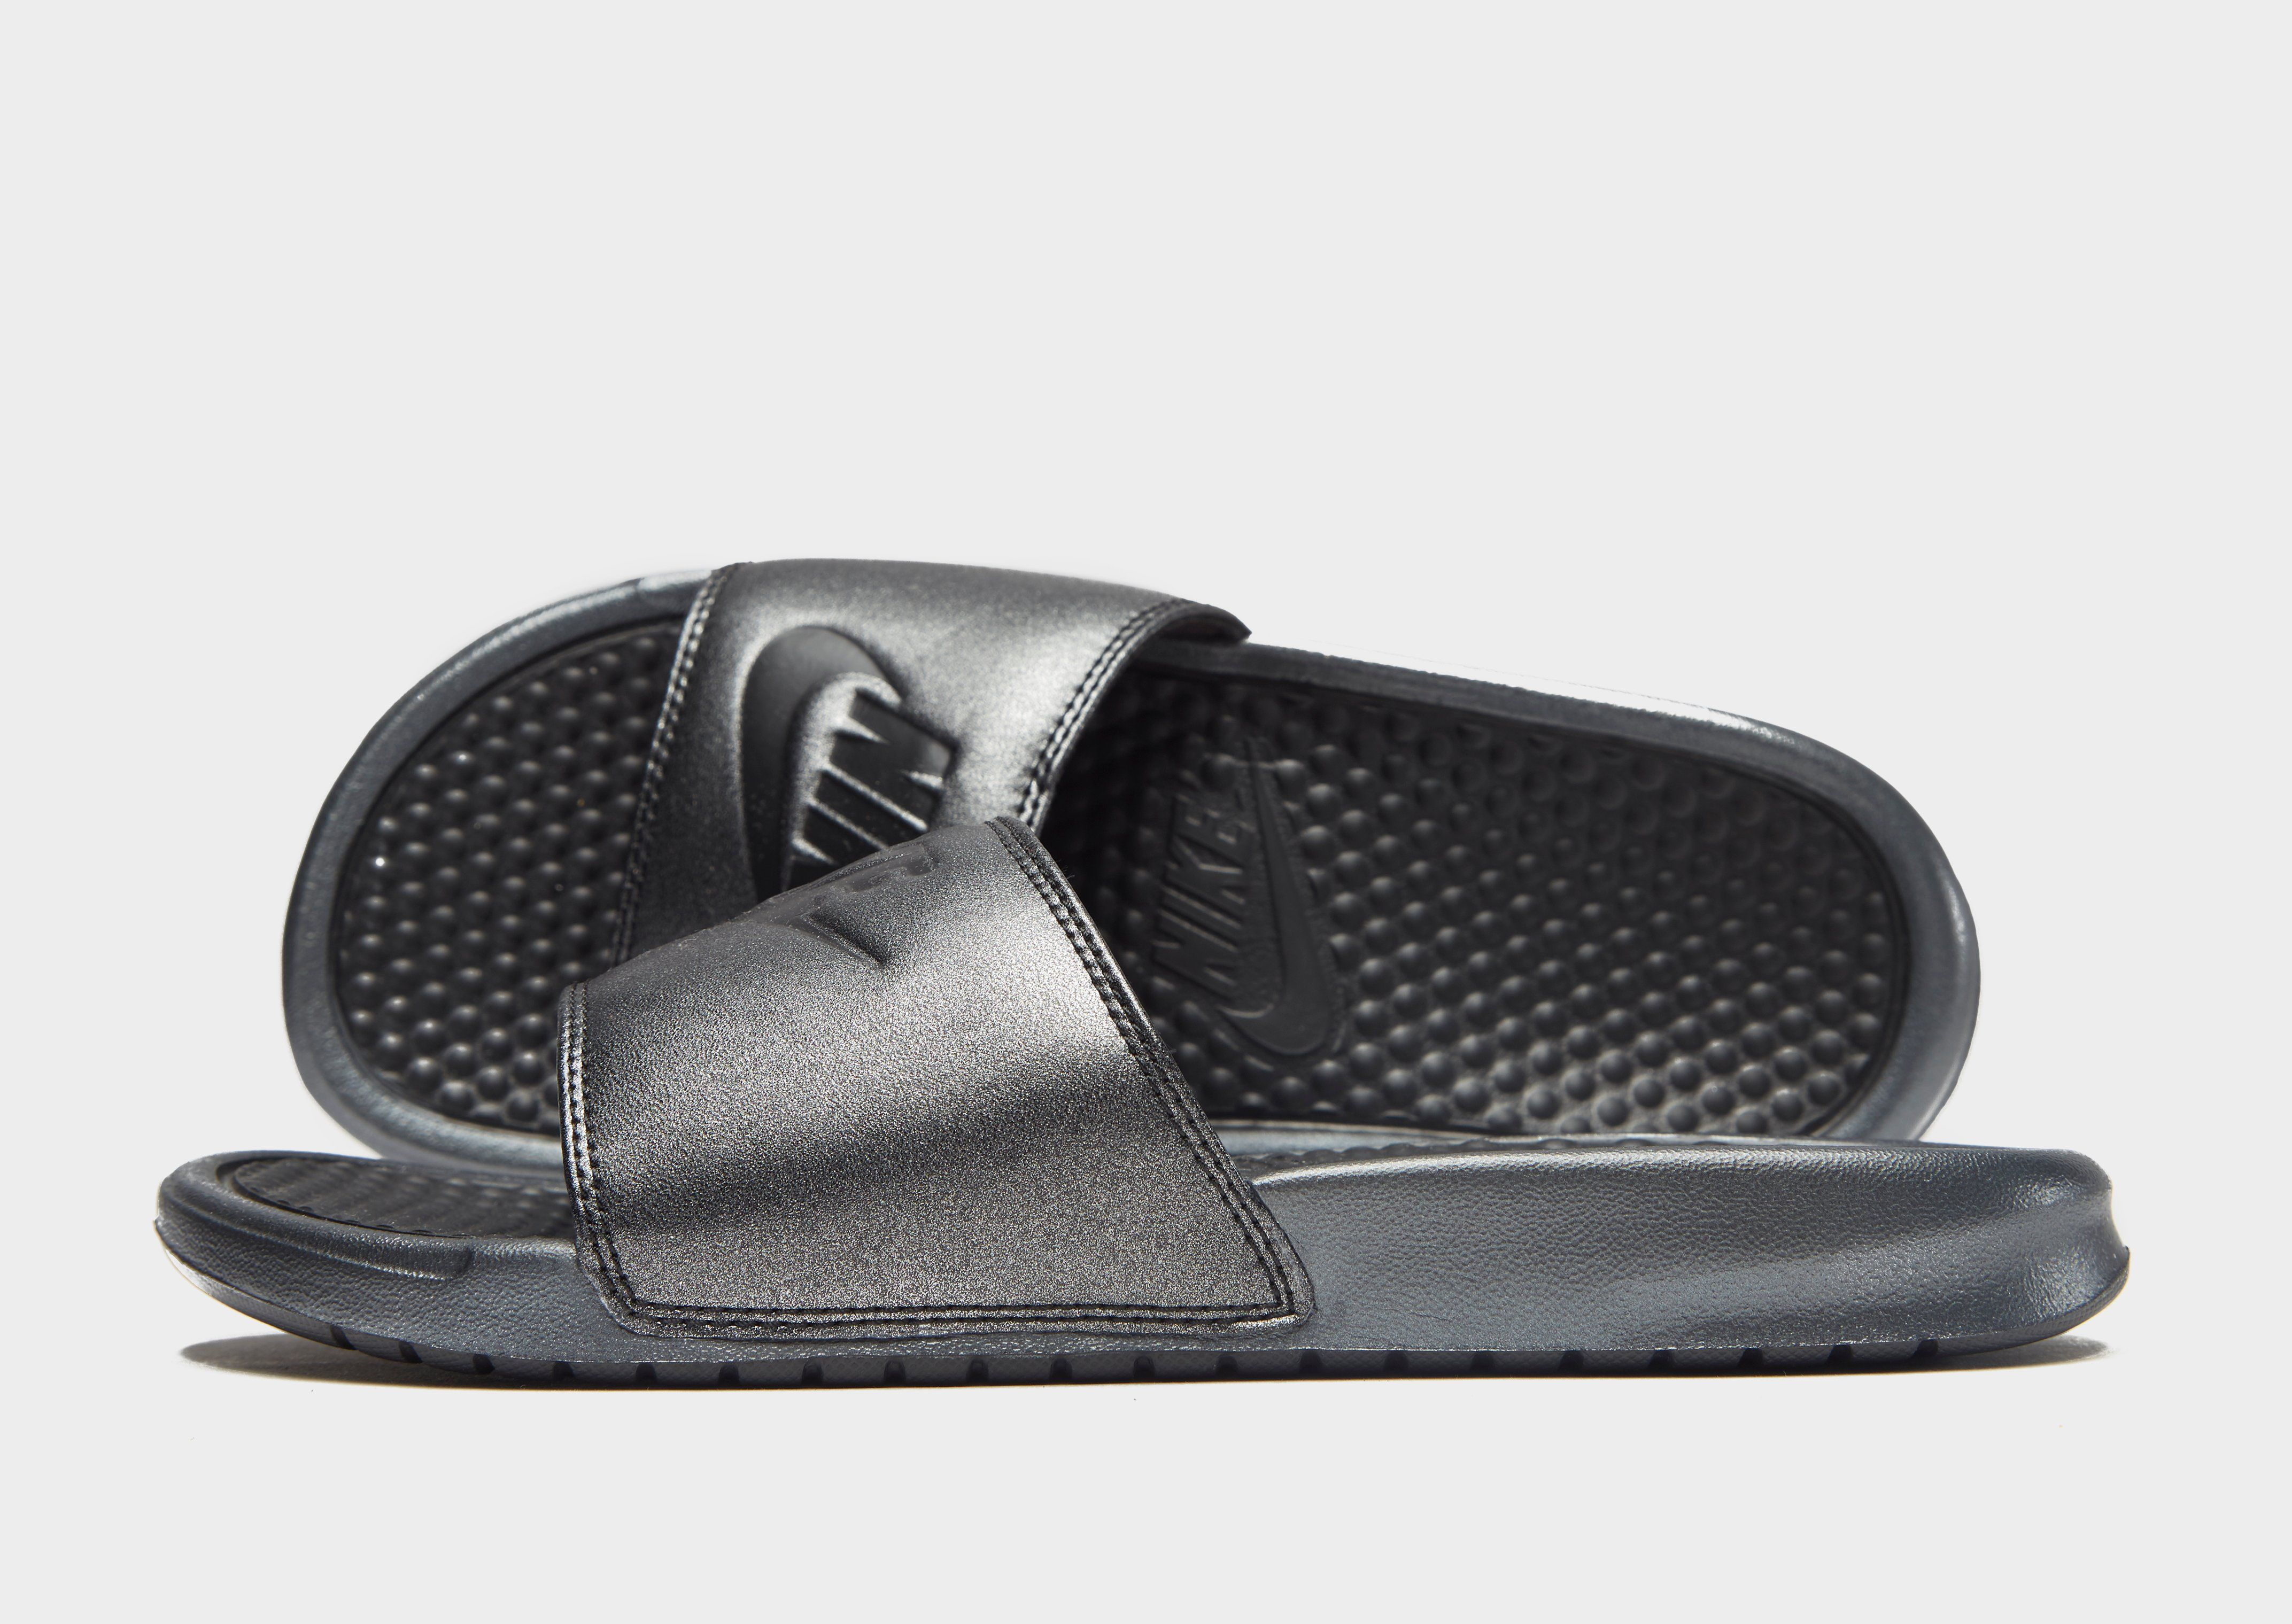 dee43631bad3 Nike Benassi Slides Women s